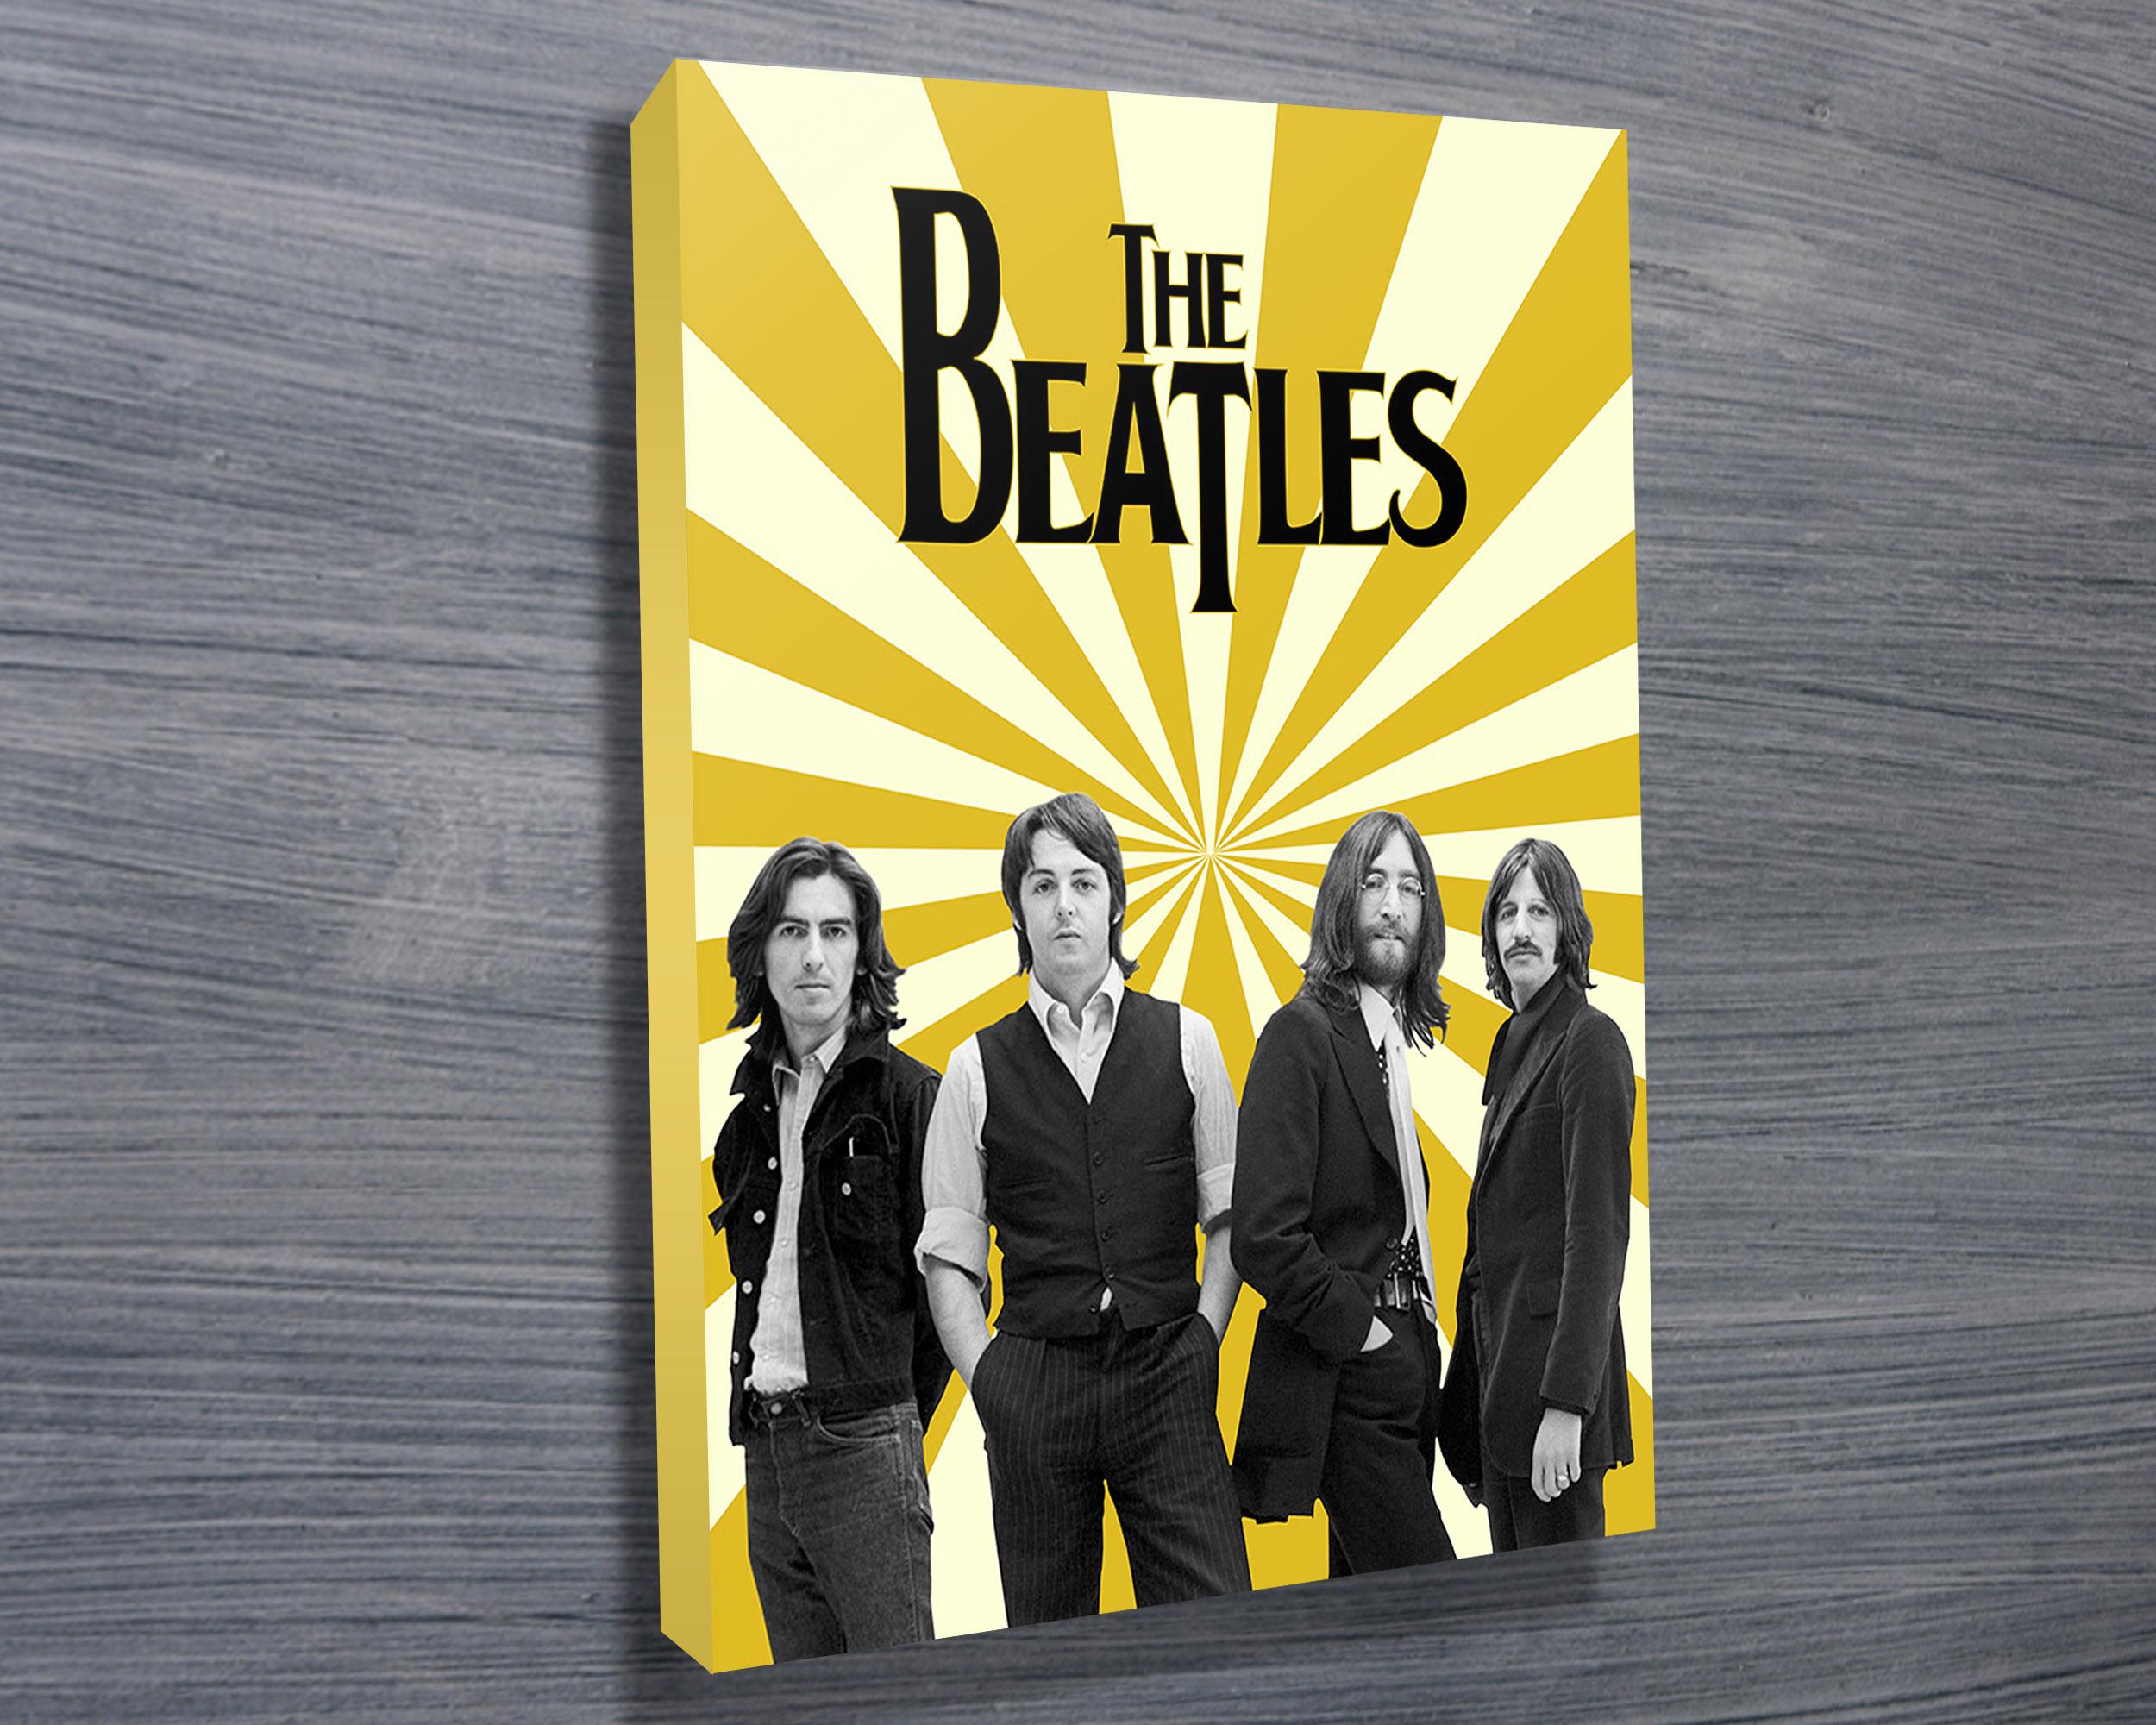 The Beatles II - Canvas Prints Australia